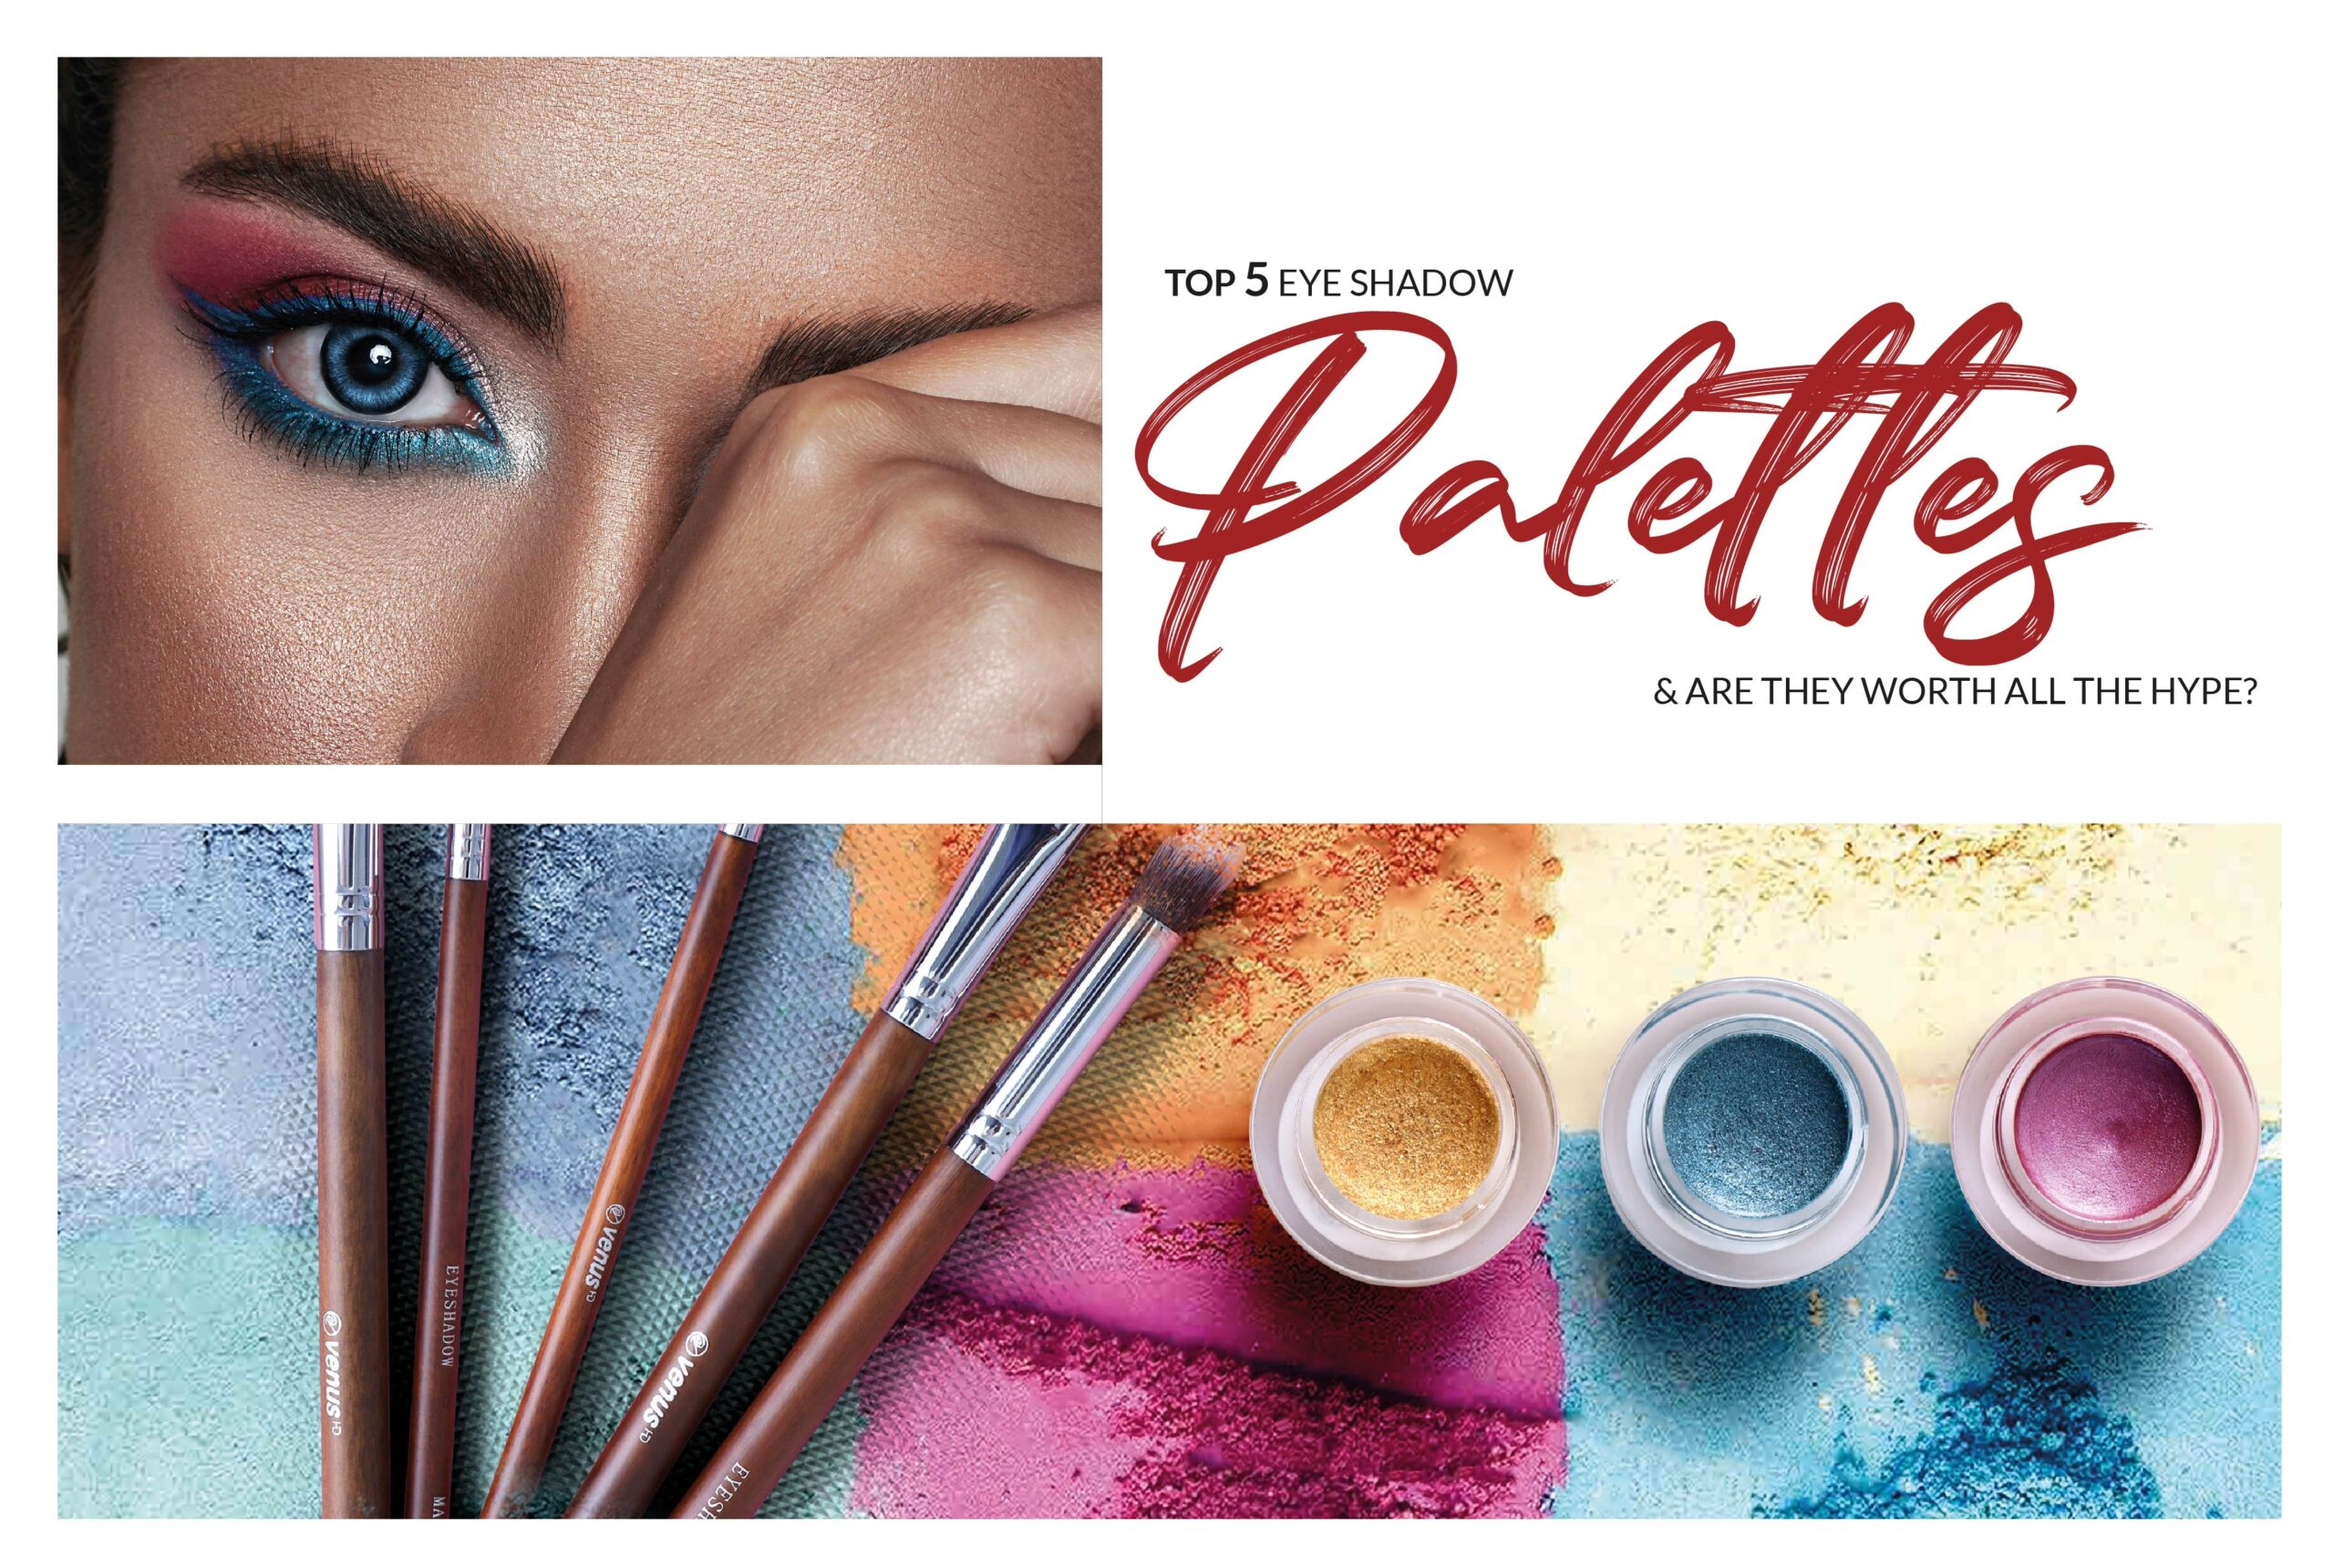 Top 5 Eye Shadow Palettes